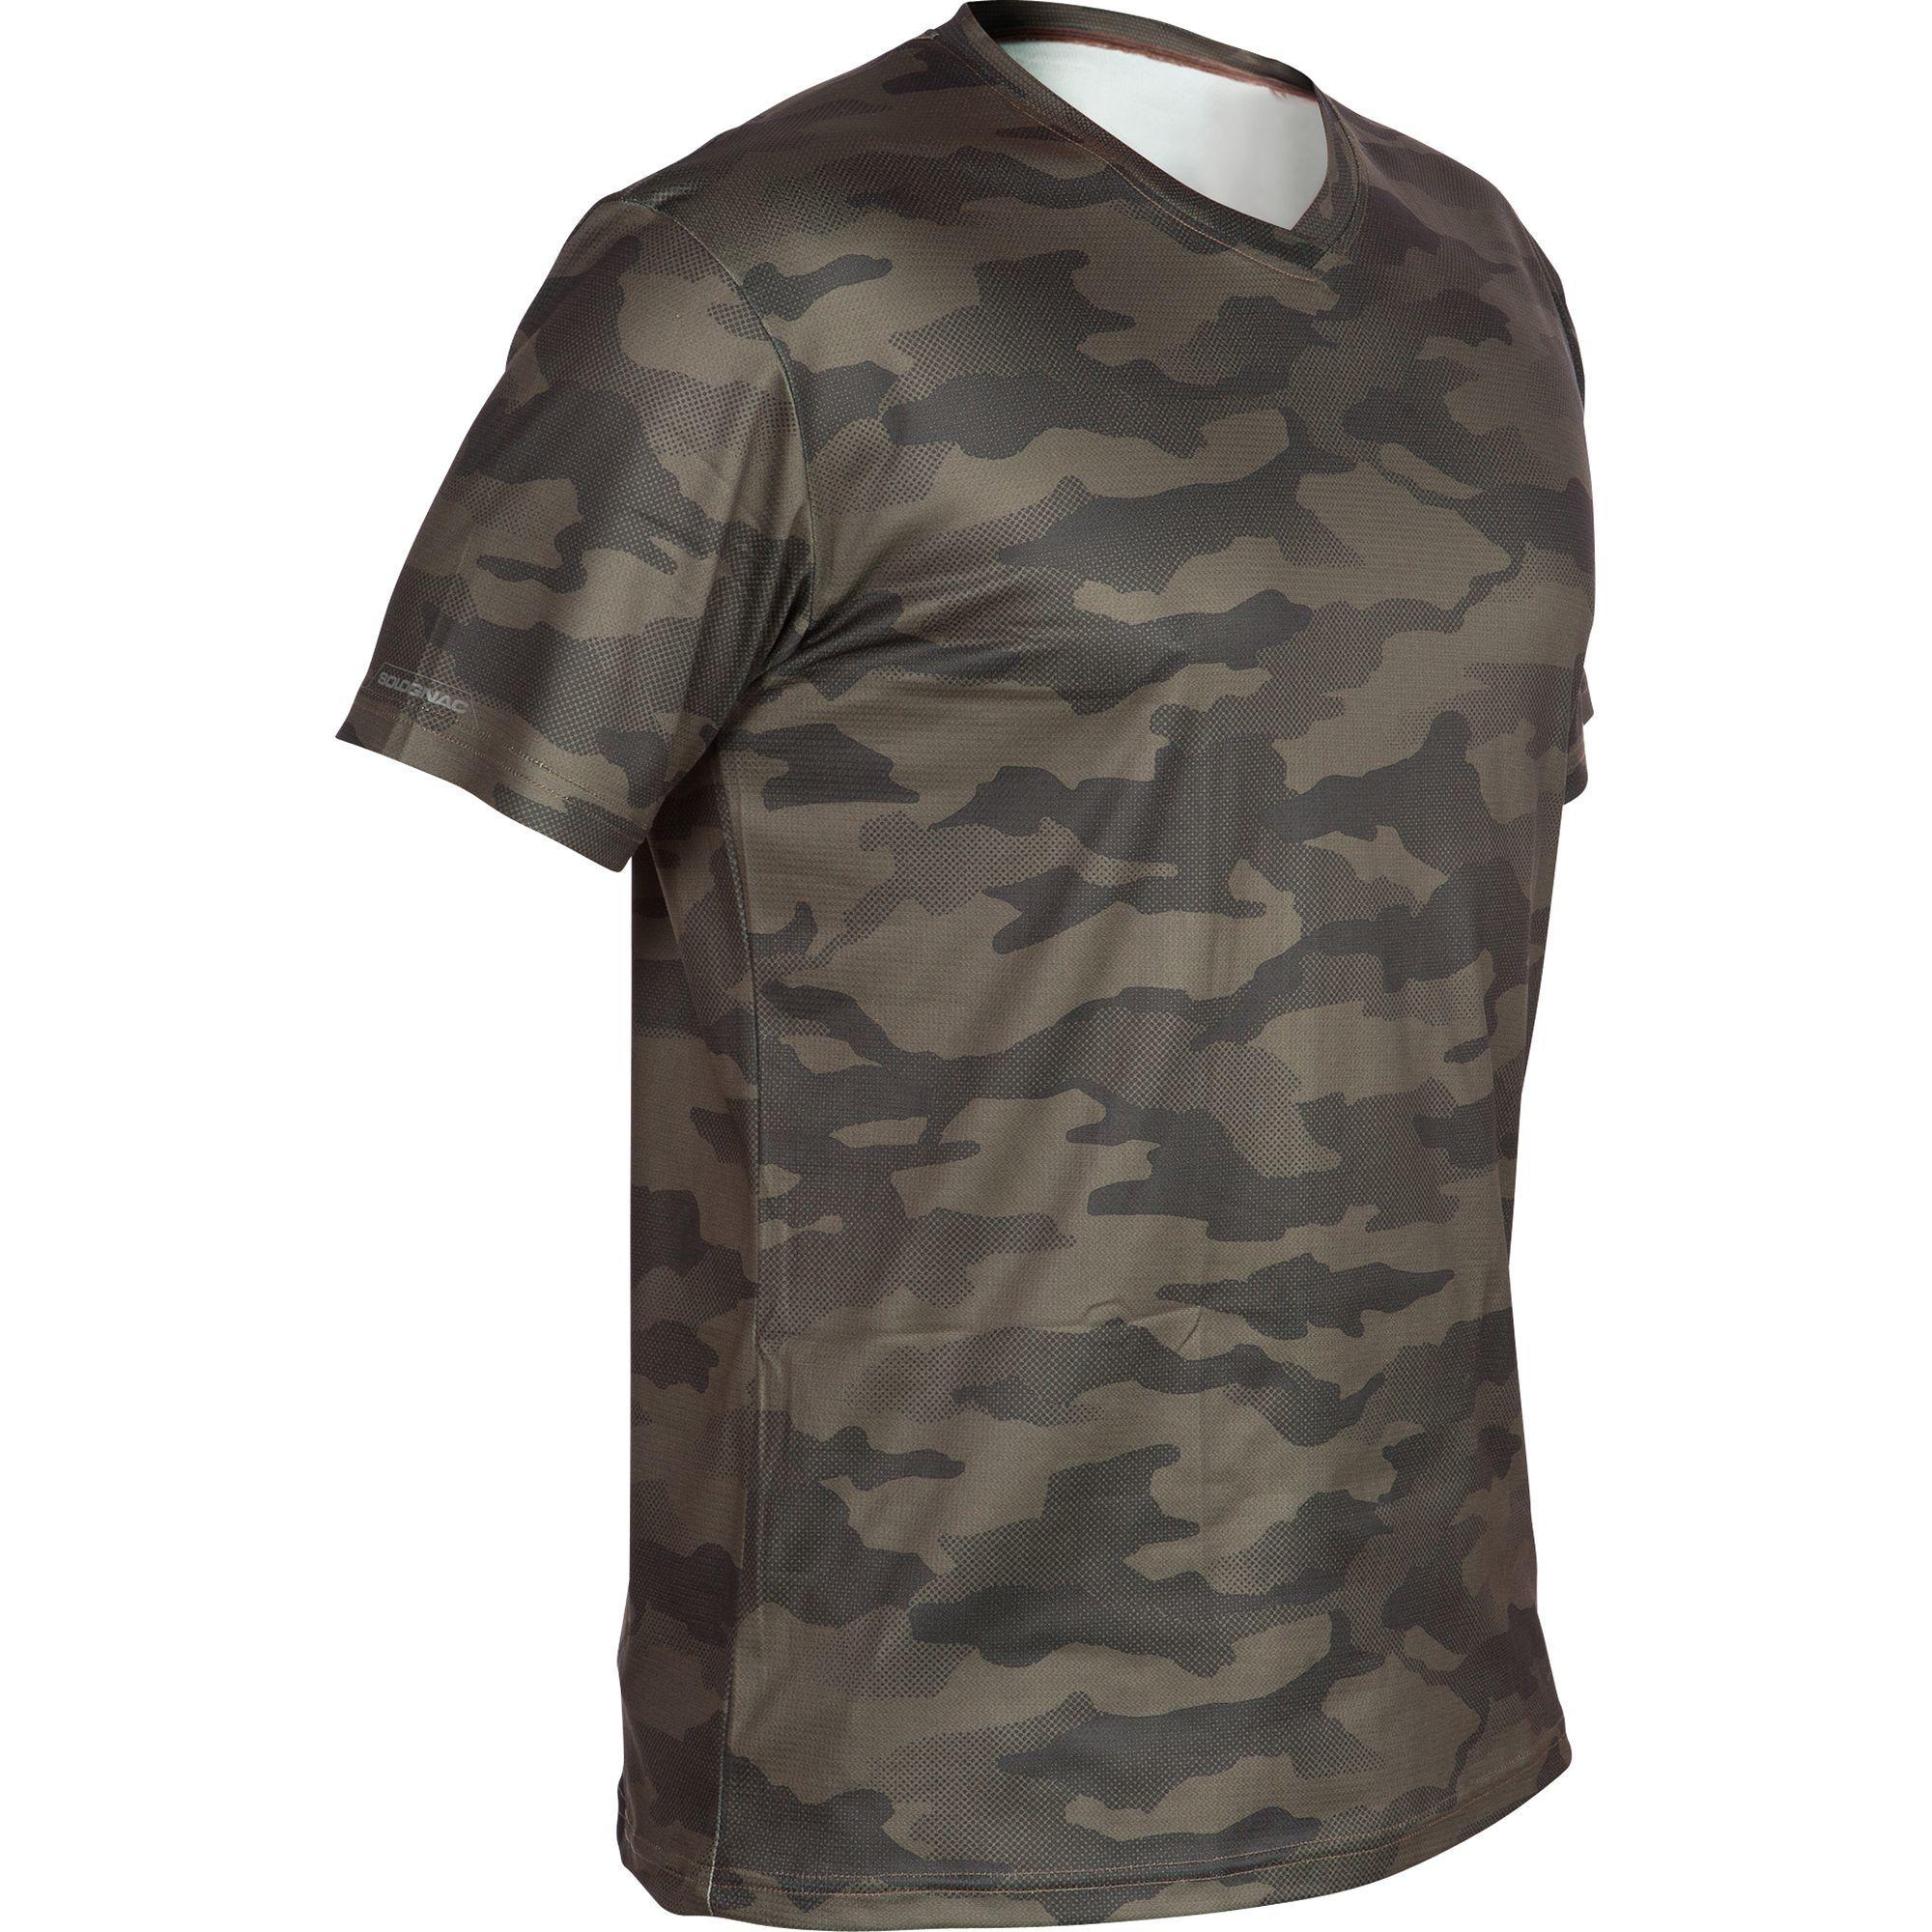 Camiseta de caza SG100 transpirable manga corta camuflaje caqui